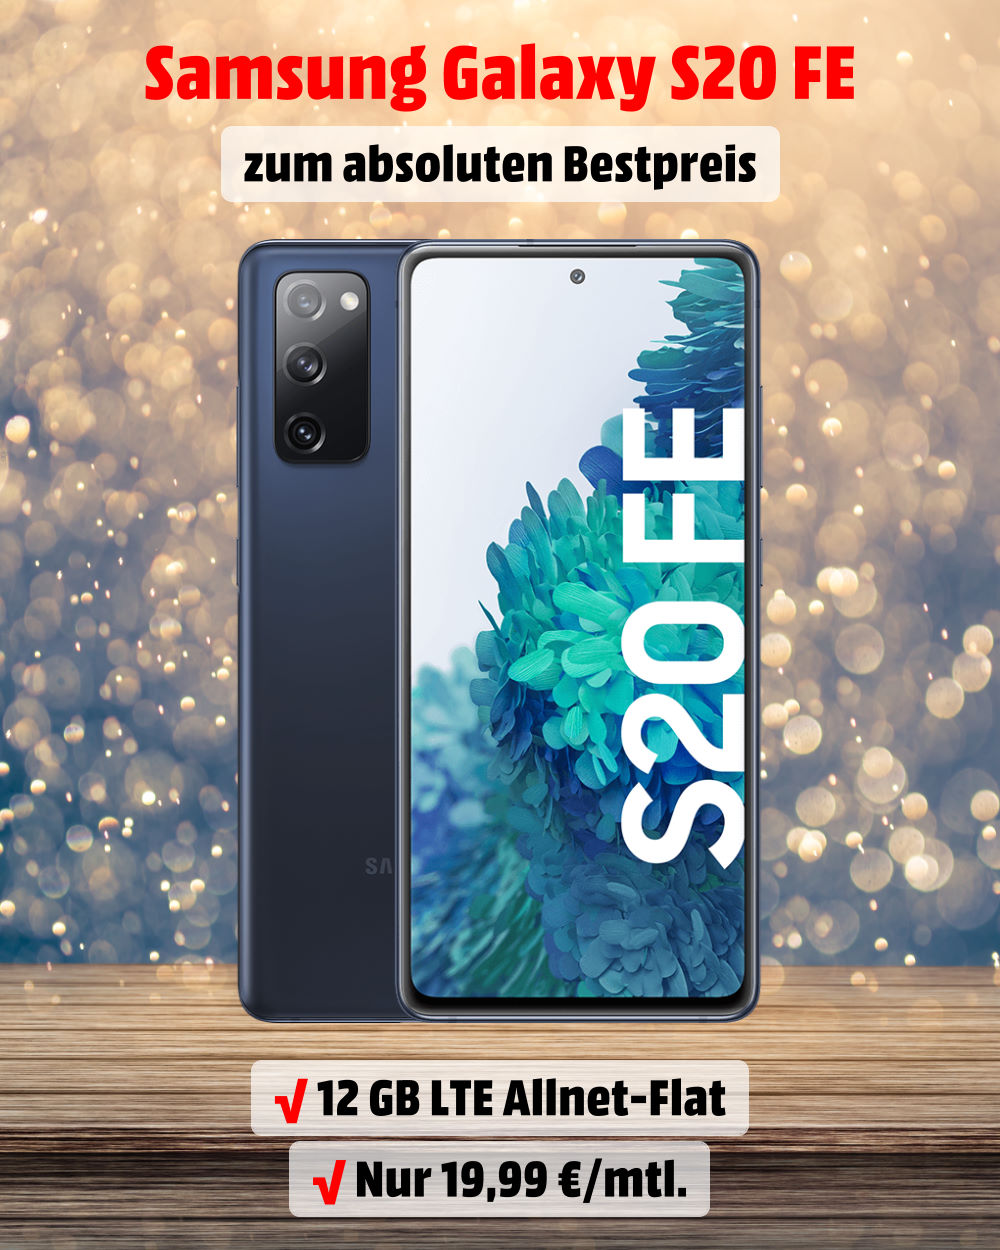 Galaxy S20 FE inkl. 12 GB LTE Allnet-Flat zum absoluten Bestpreis - Handy-Tarifvergleich